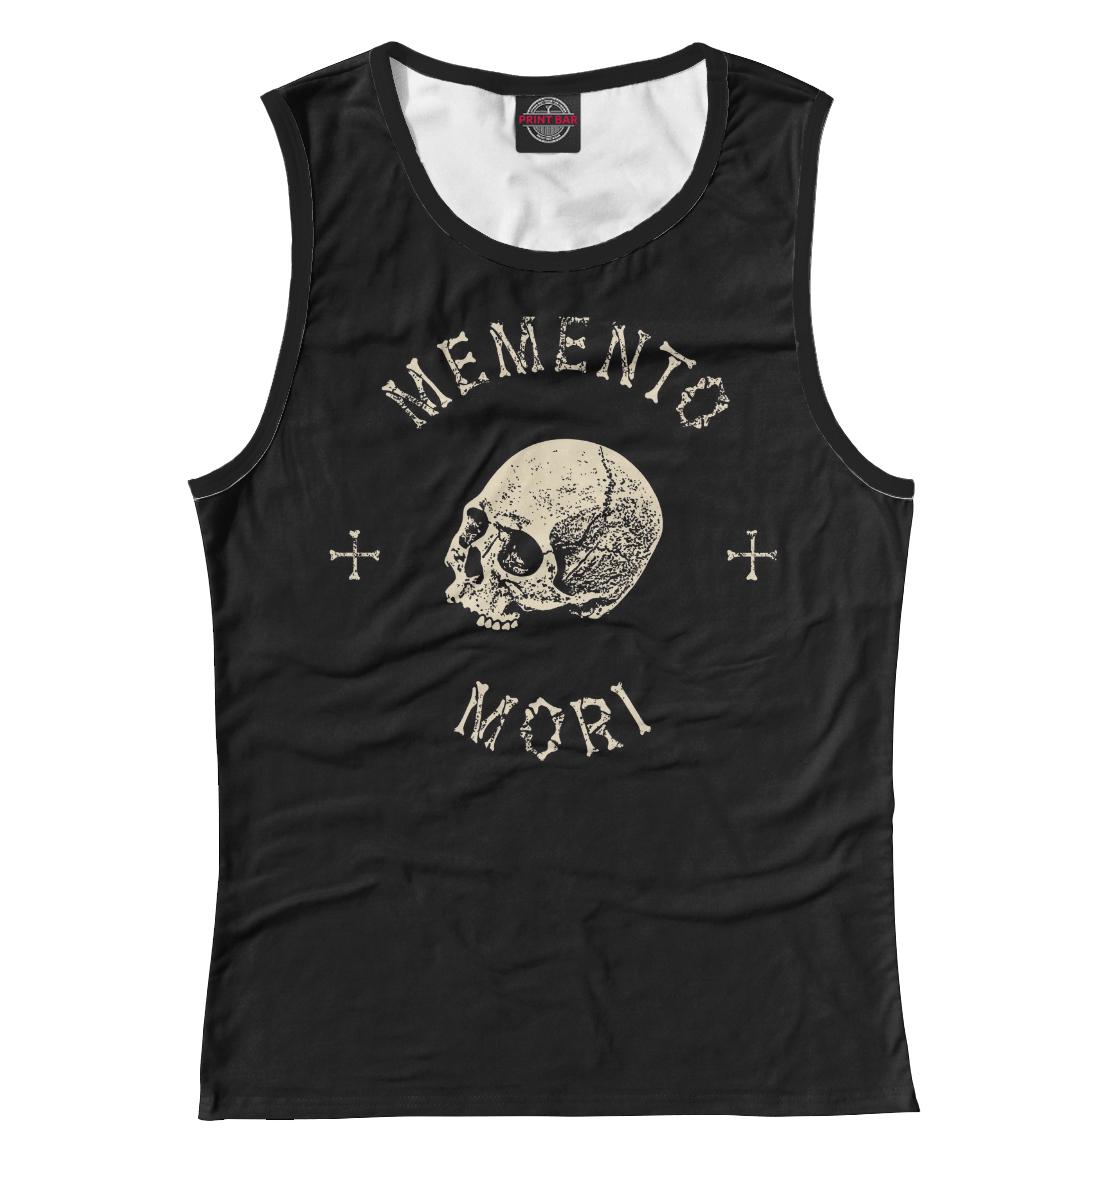 Купить Memento mori, Printbar, Майки, SKU-538470-may-1